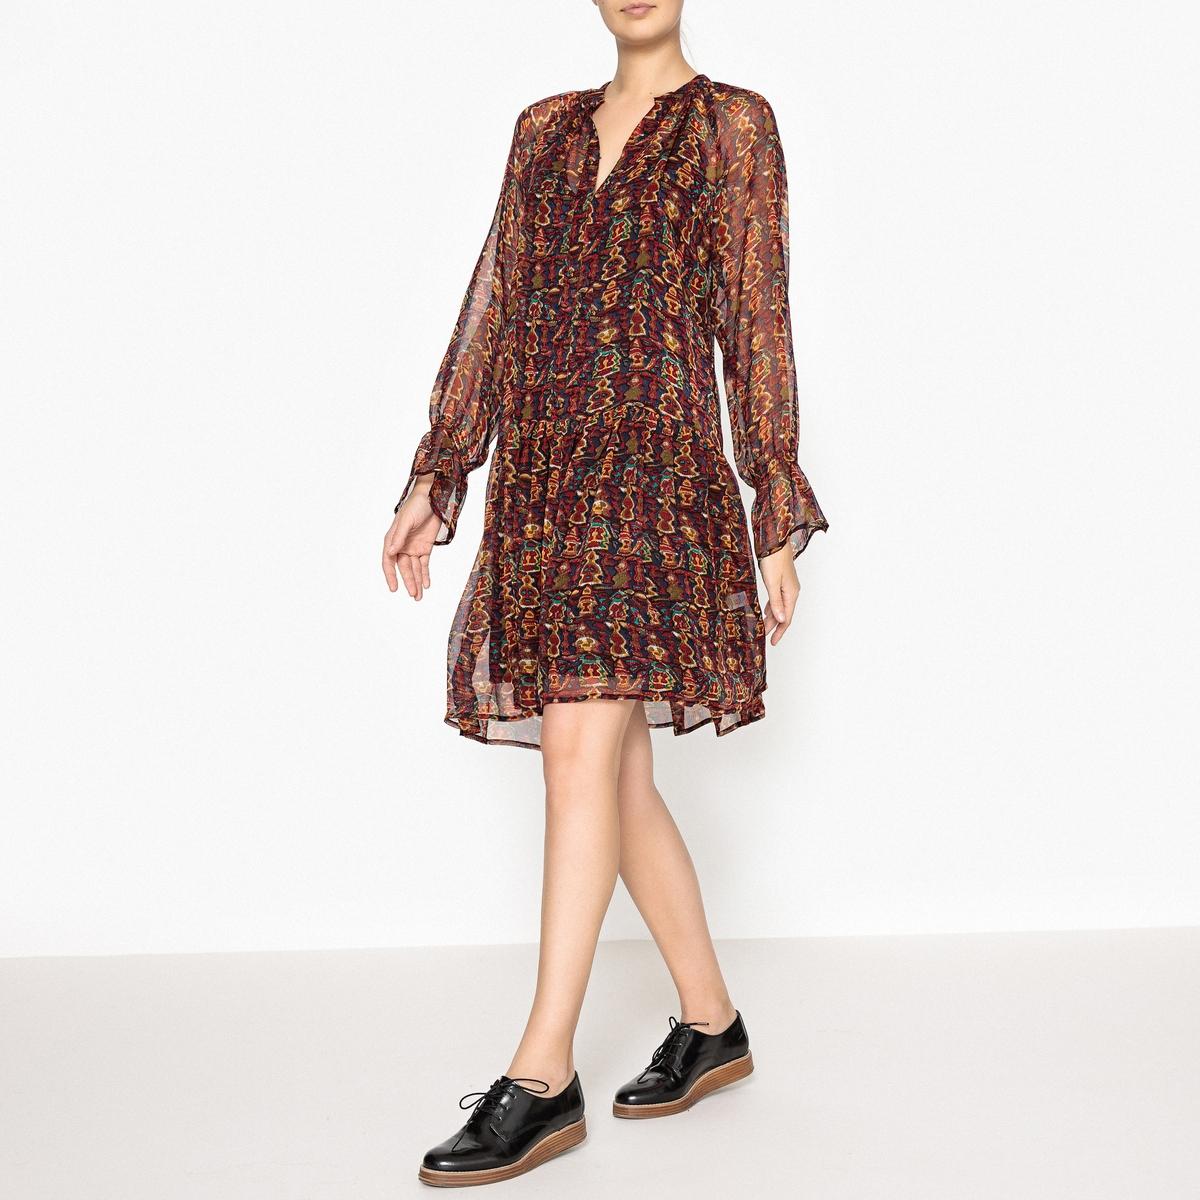 Платье с рисунком MERYS MINI DRESS antik batik короткое платье